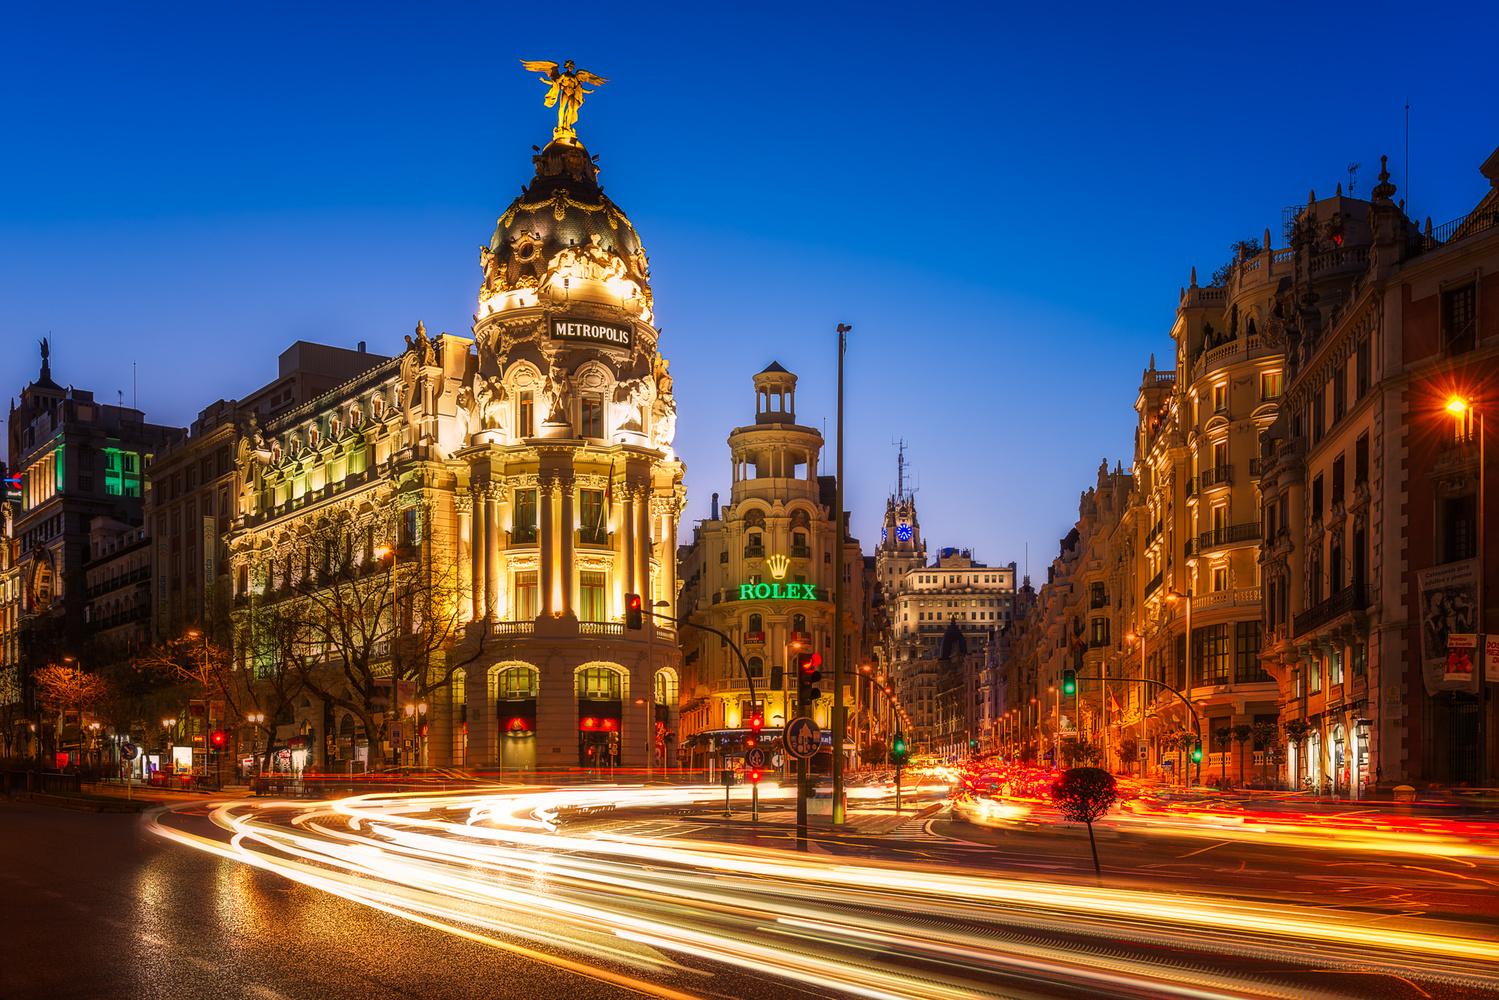 Gran Via and The Metropolis Building | Madrid, Spain by Nico Trinkhaus